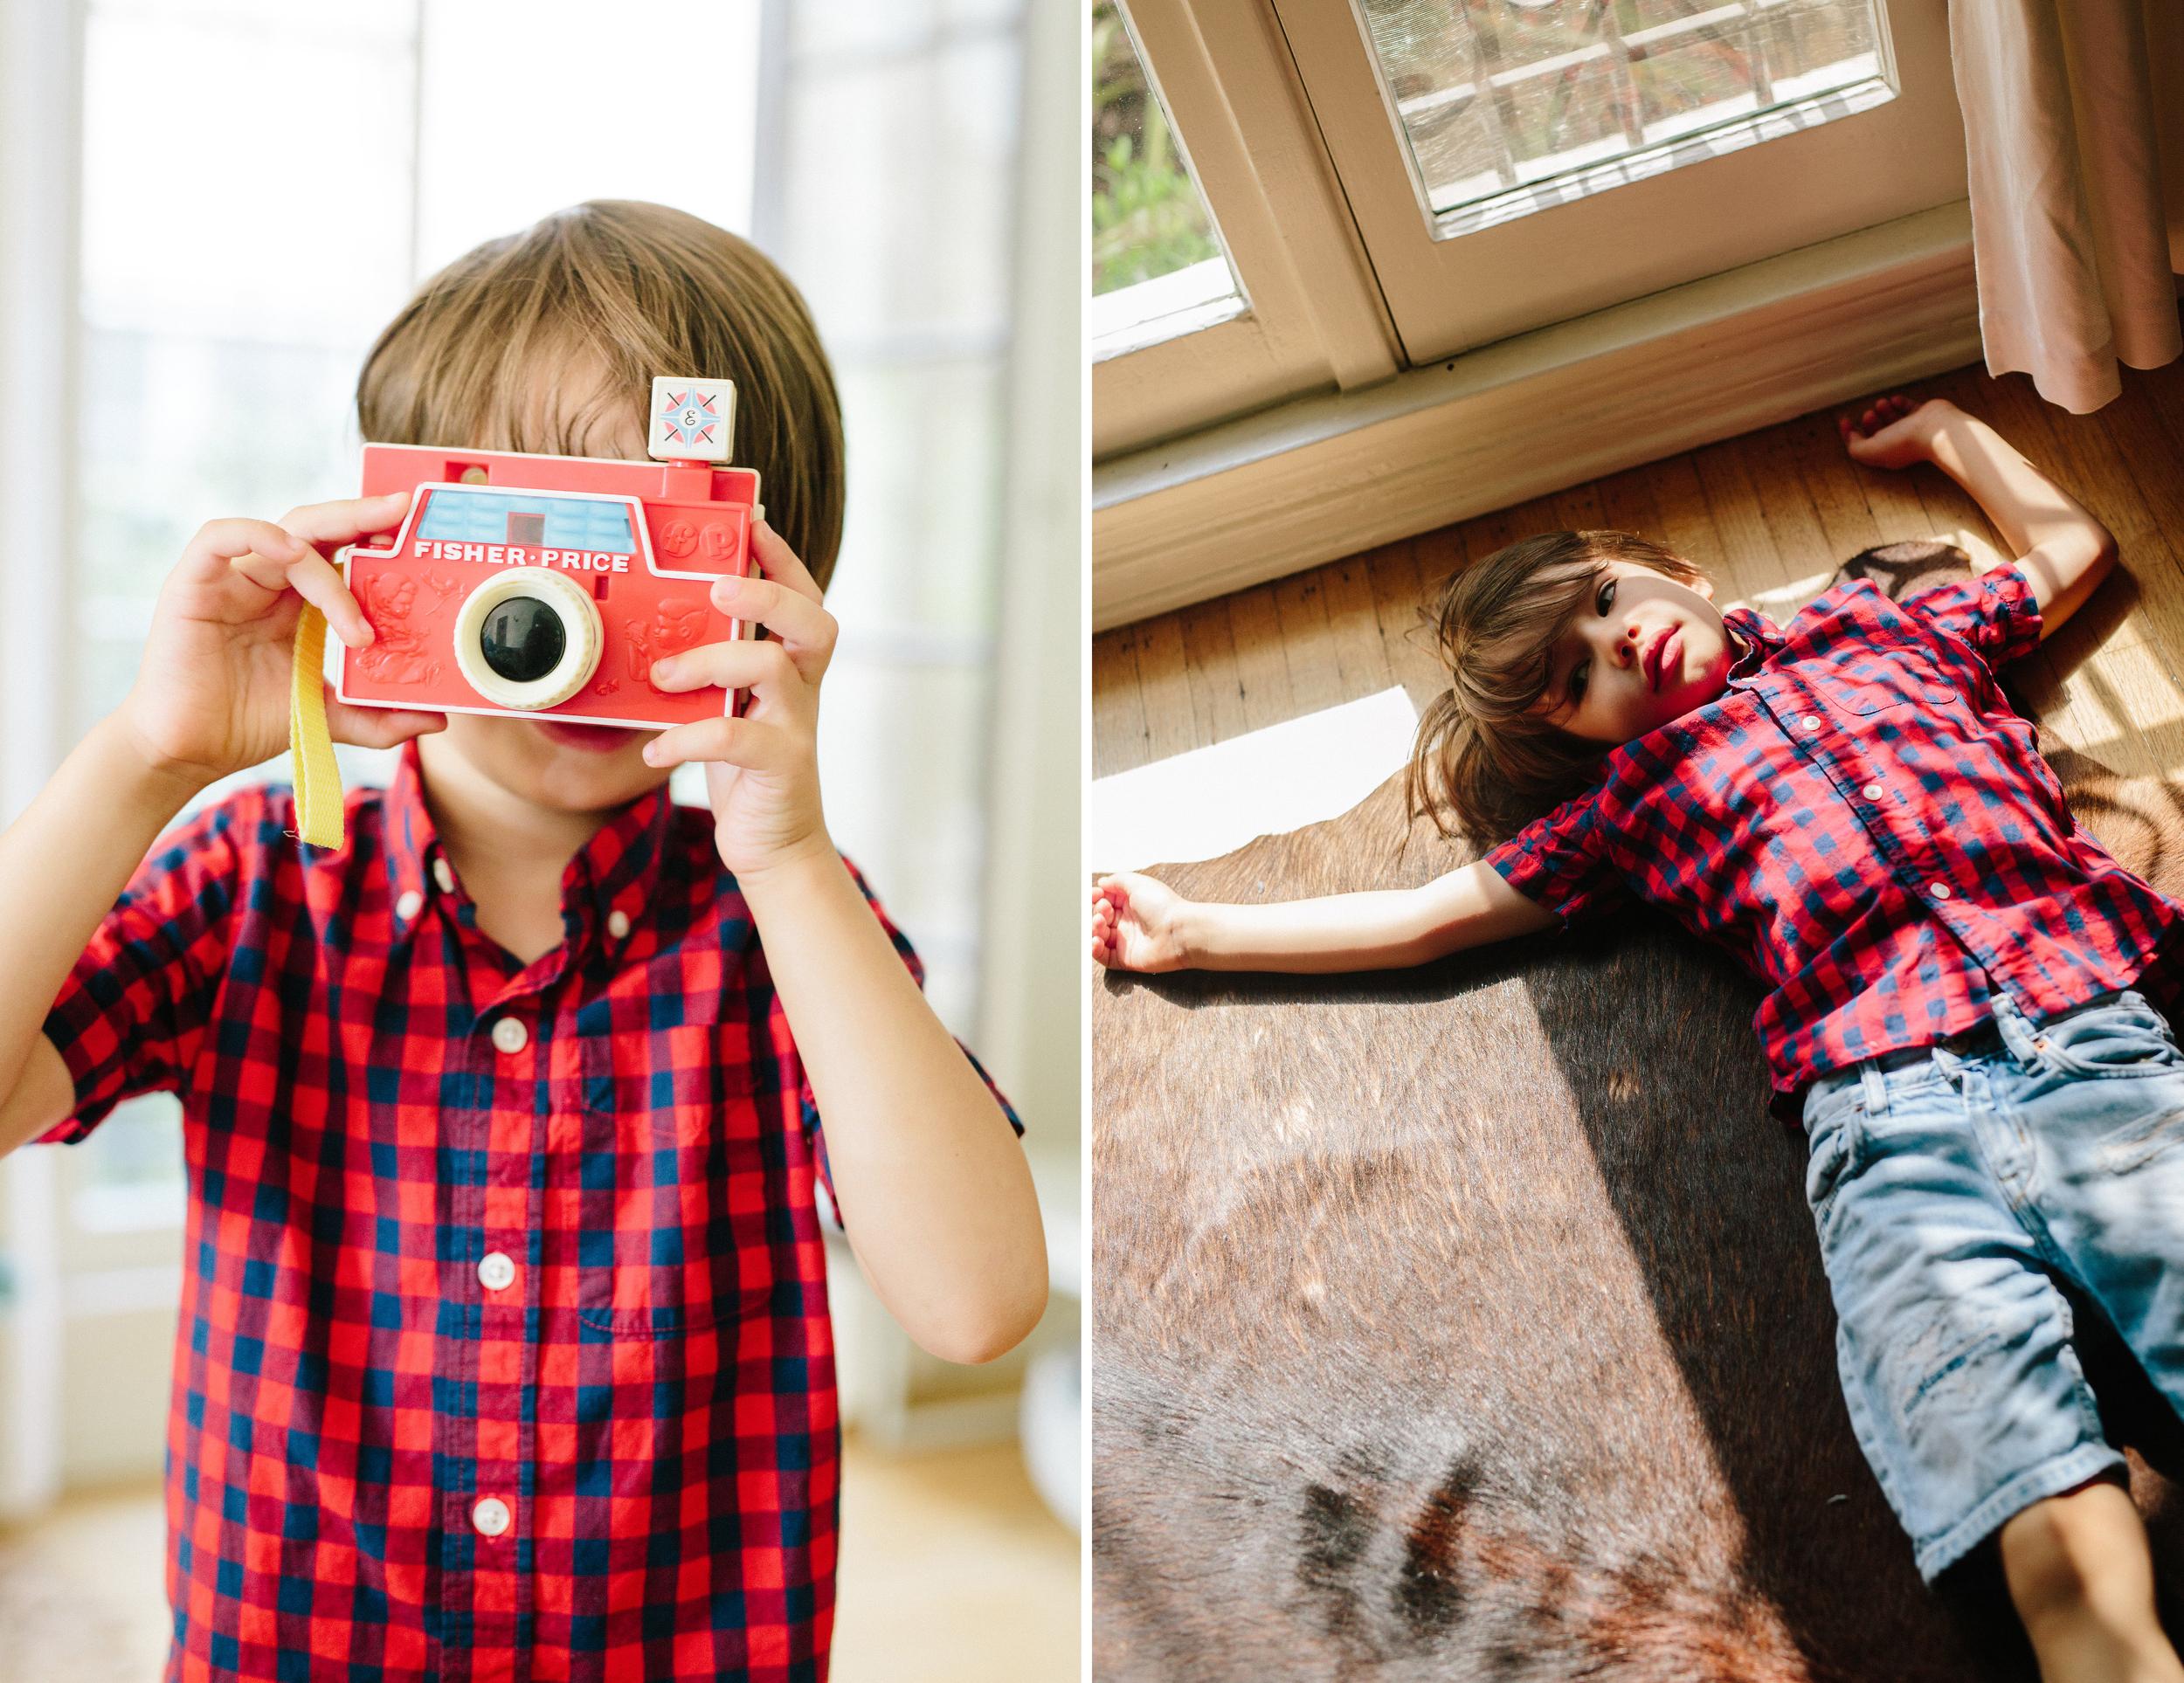 los-angeles-lifestyle-family-child-kid-baby-photographer_5.jpg